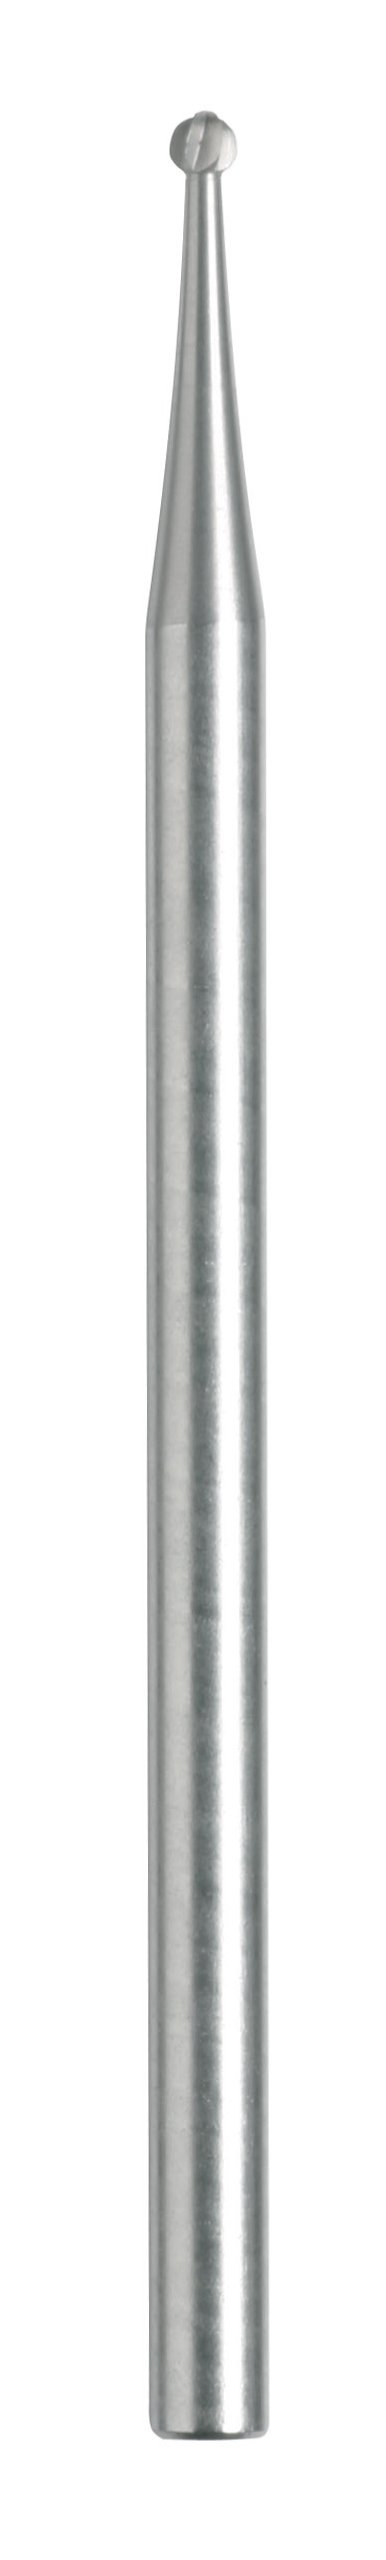 Dremel 109 Engraving Cutter 1/16-inch, 1/8-inch Shank